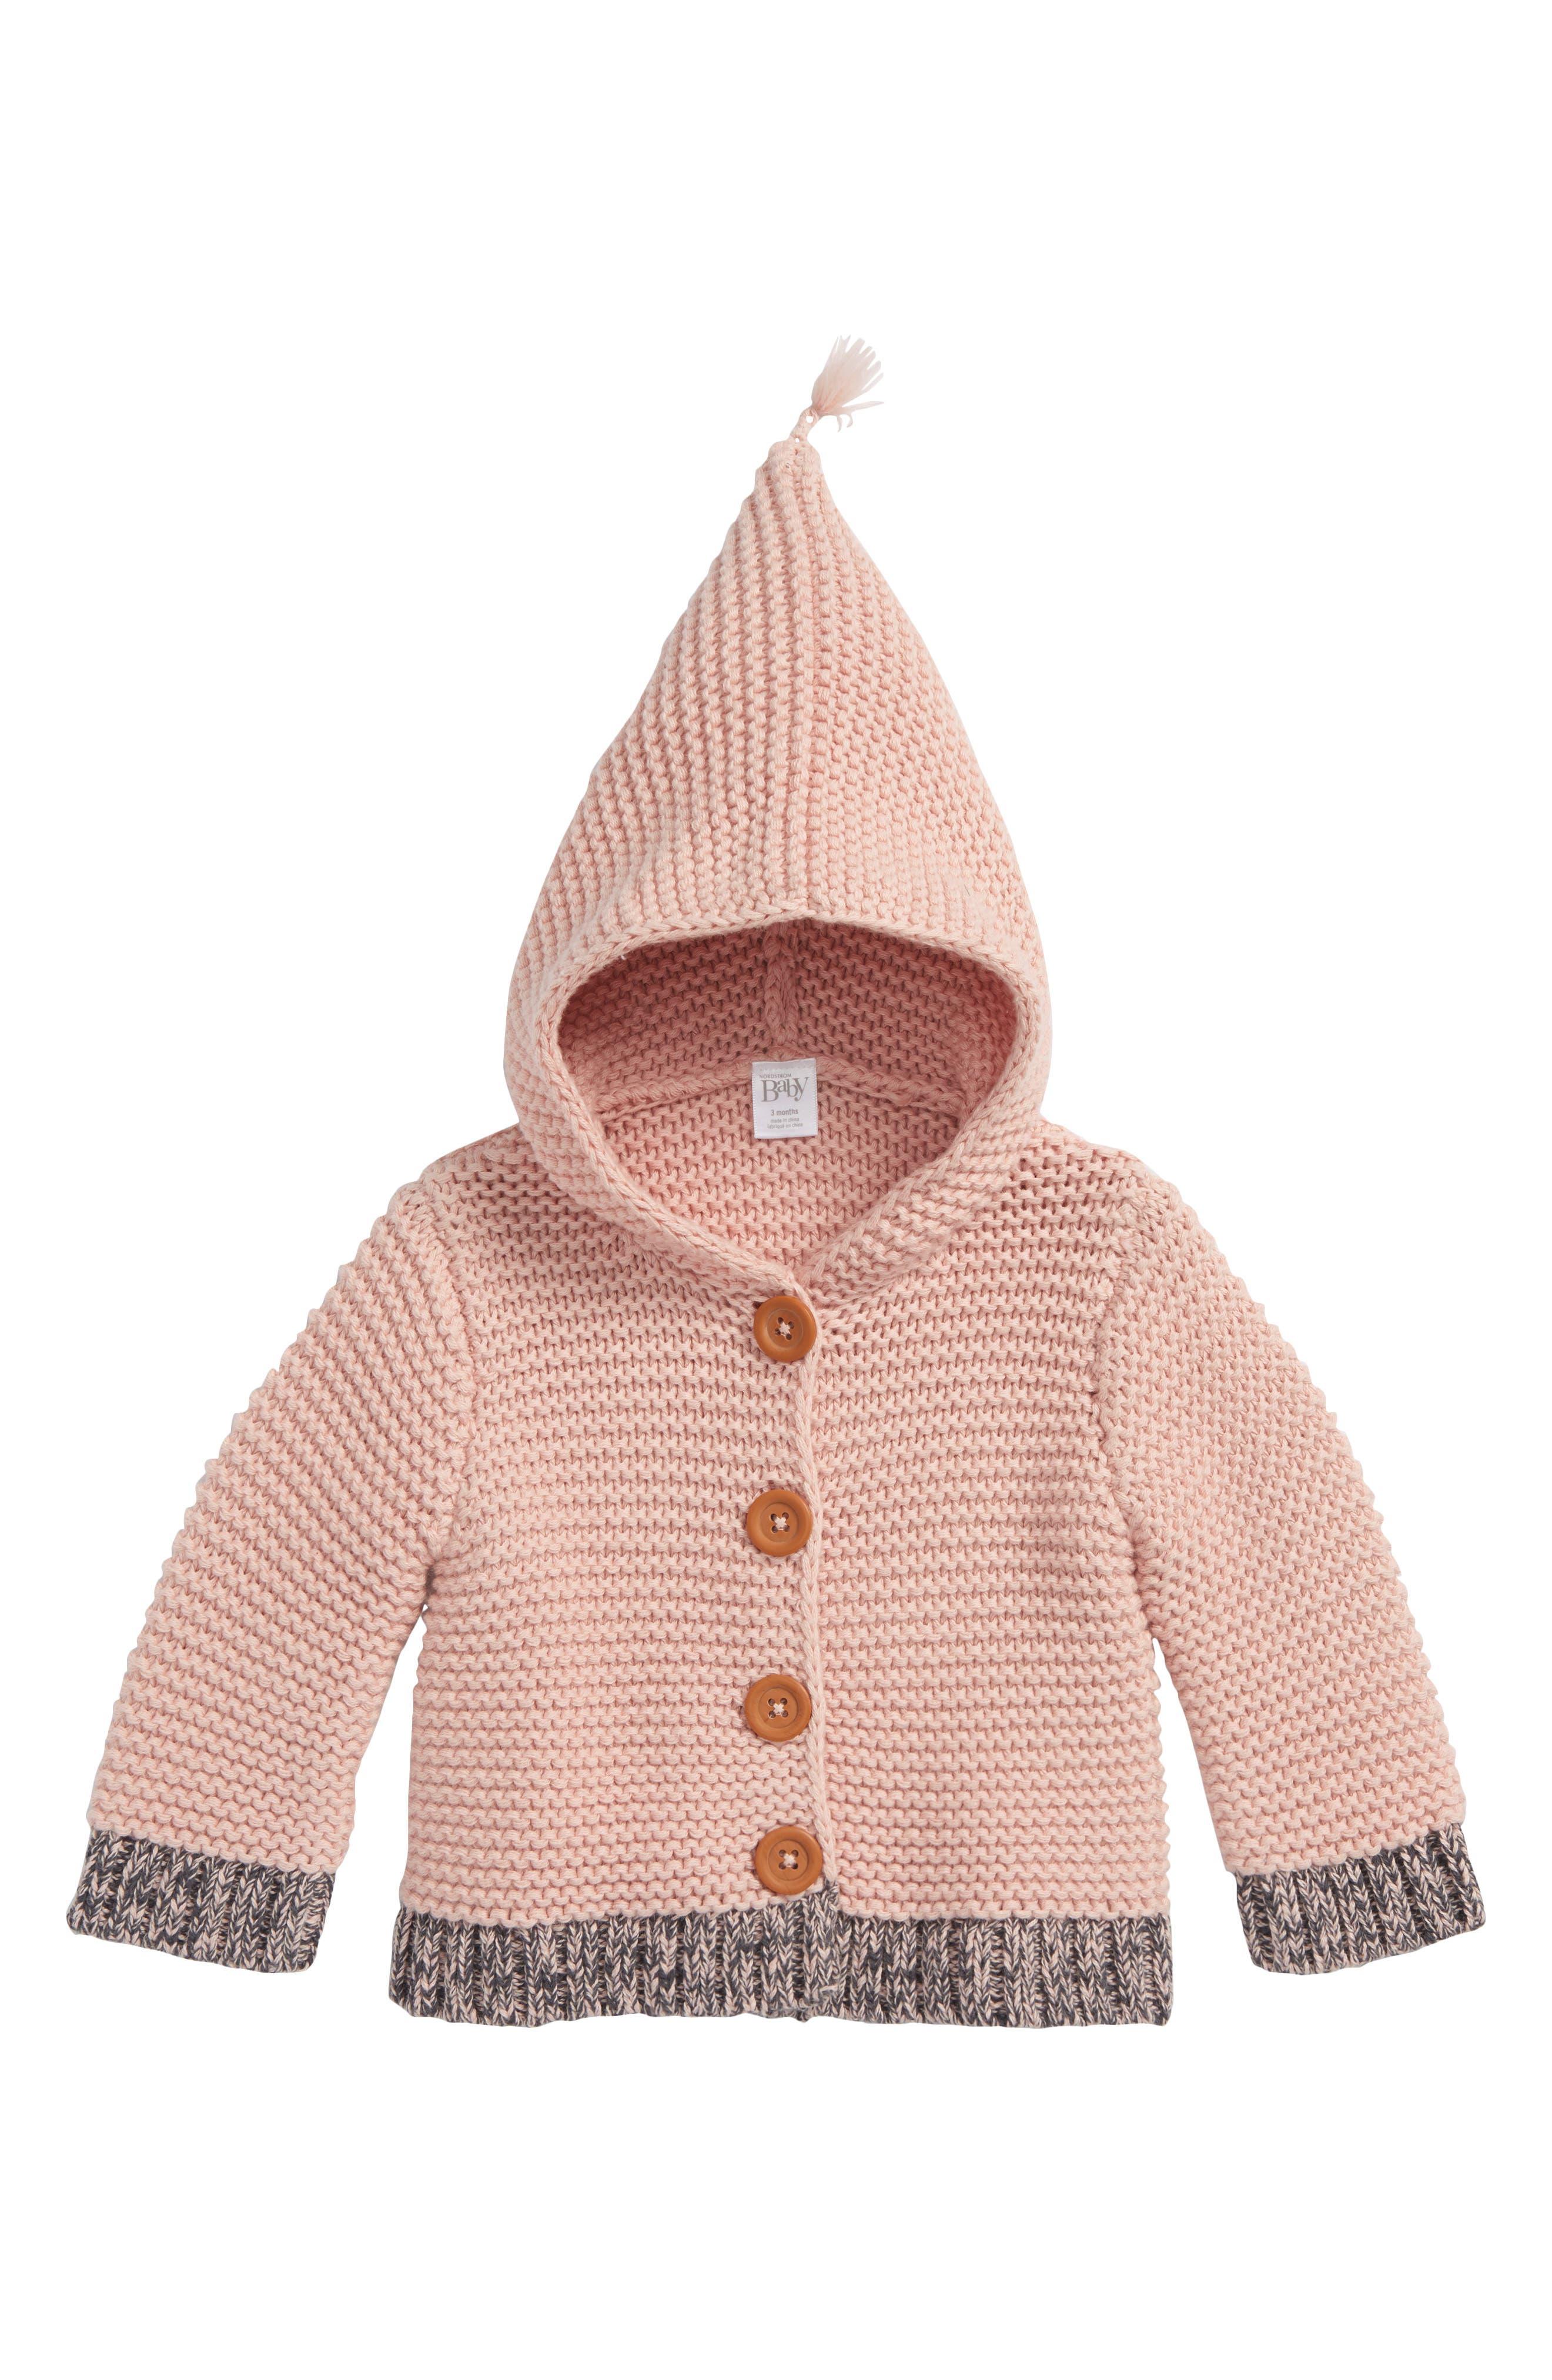 Organic Cotton Hooded Cardigan,                             Main thumbnail 1, color,                             680